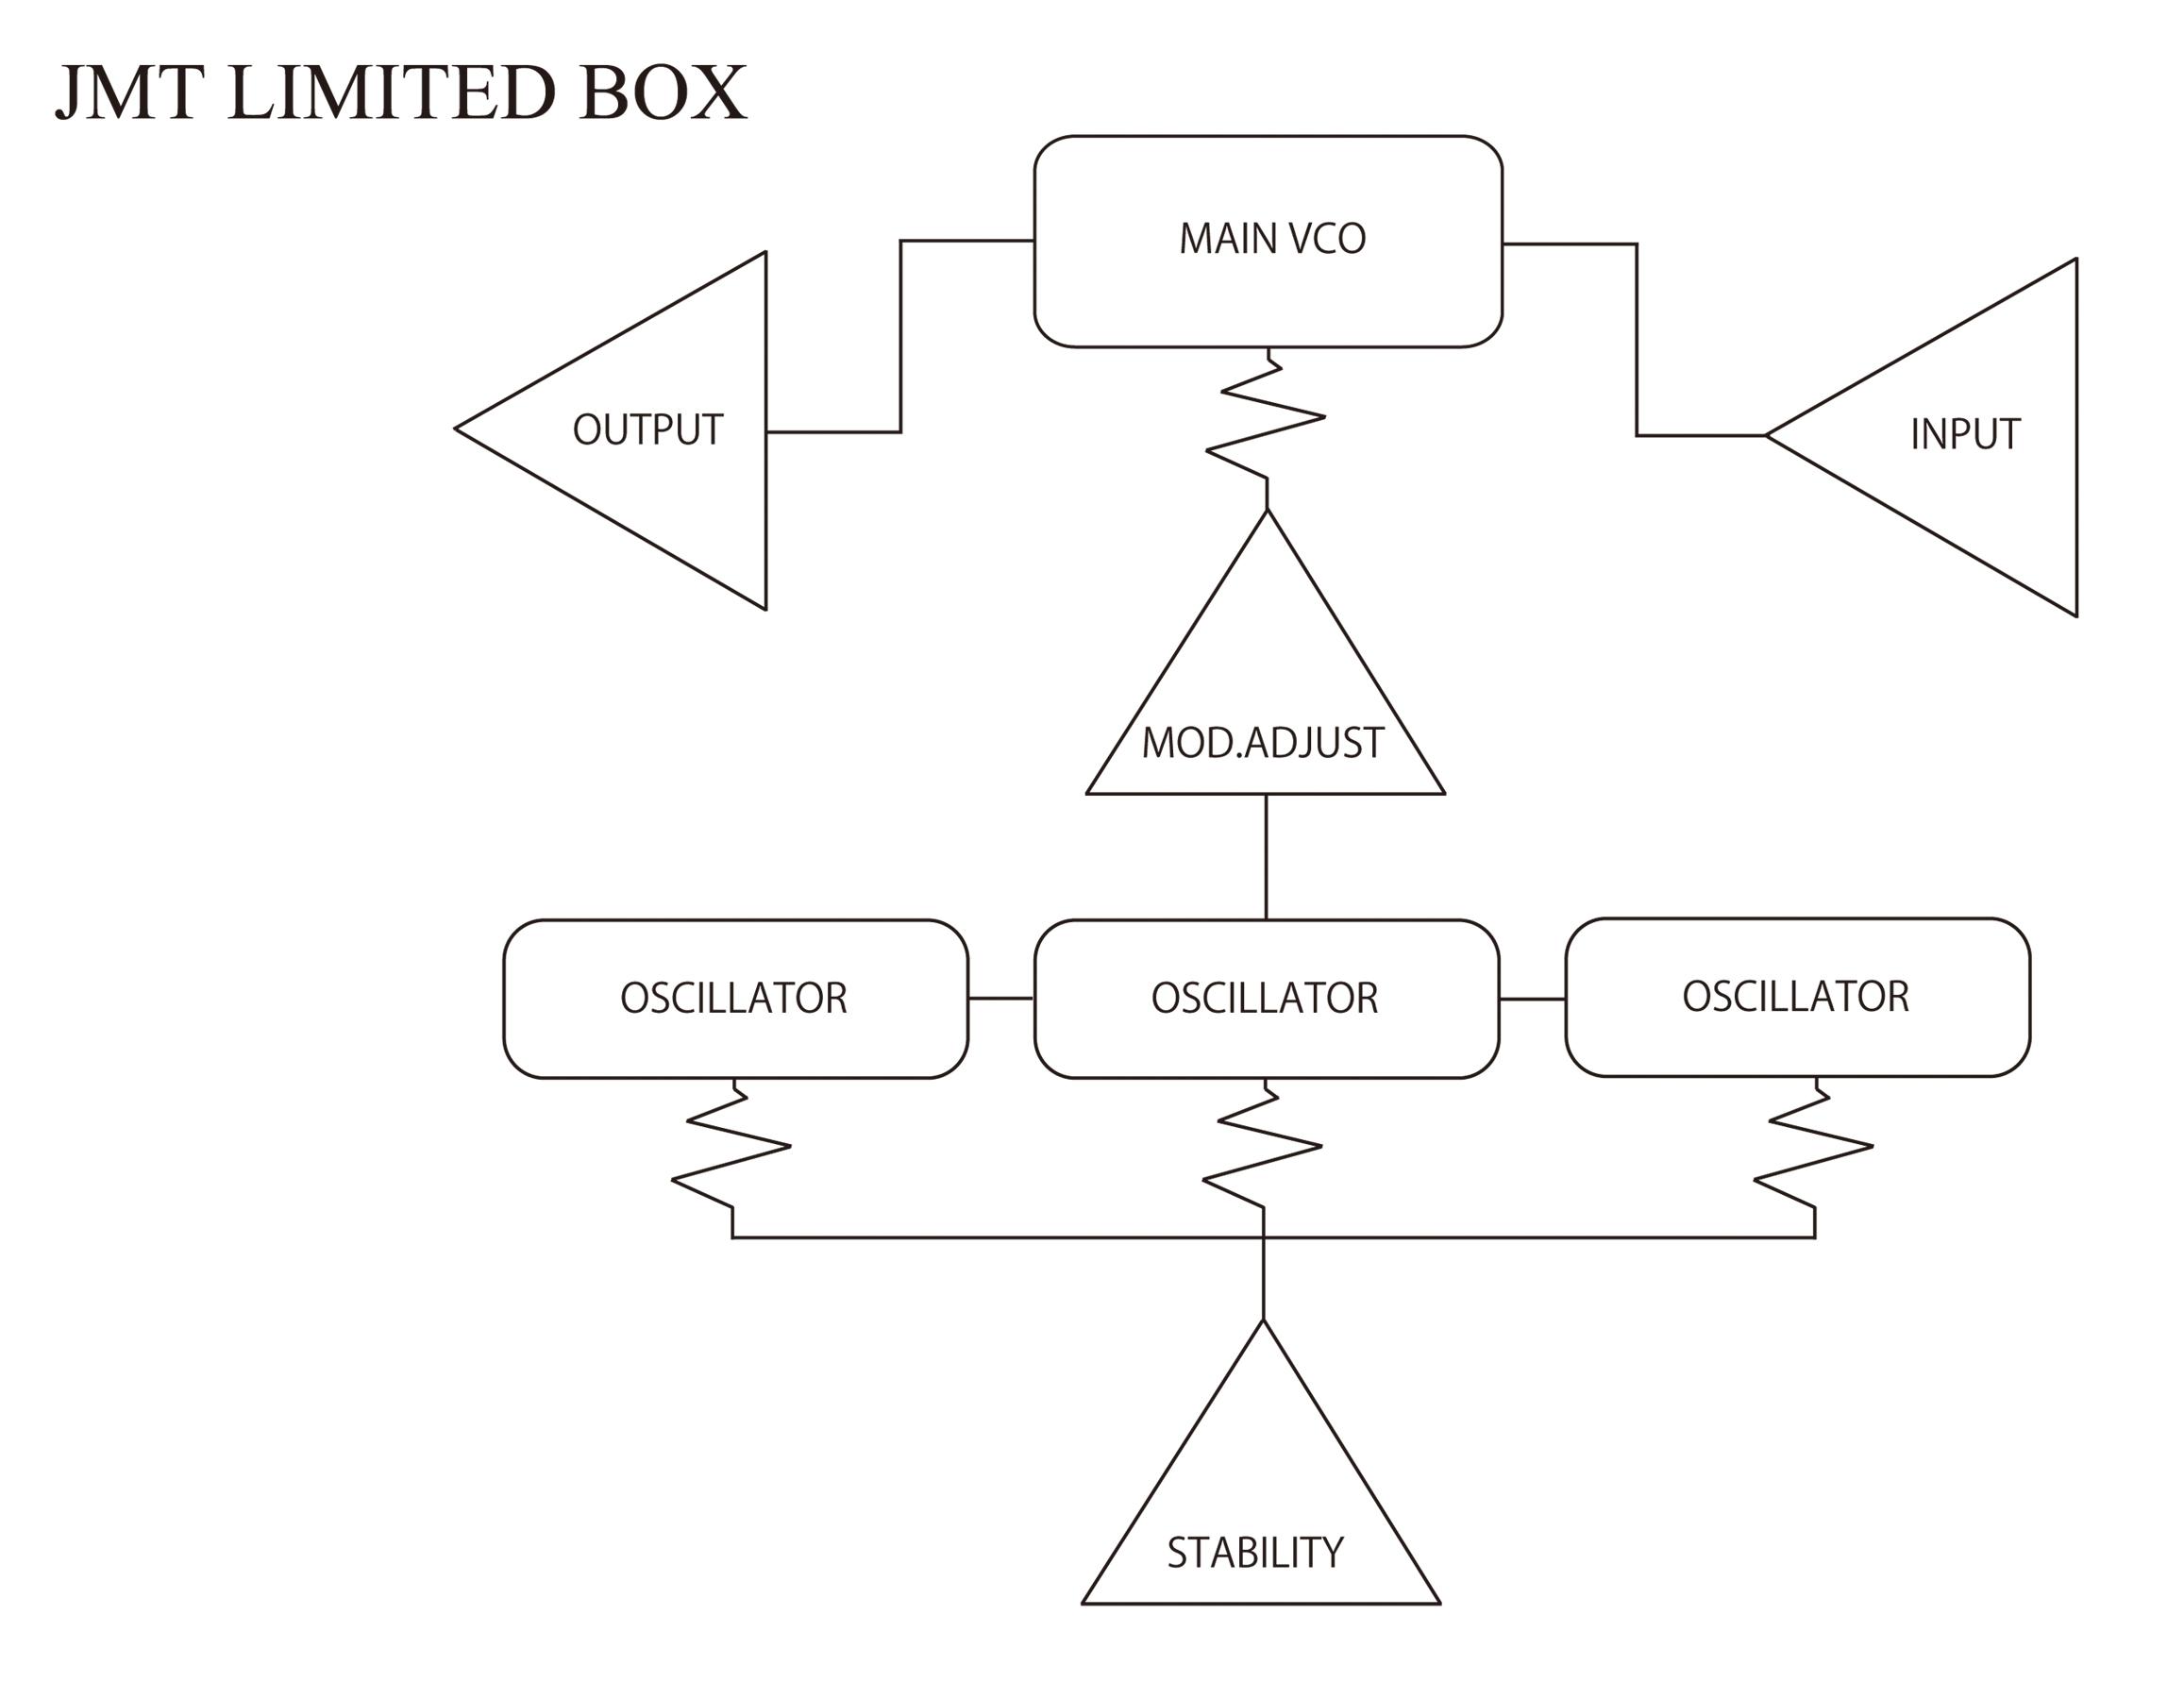 jmt-limited-box-説明